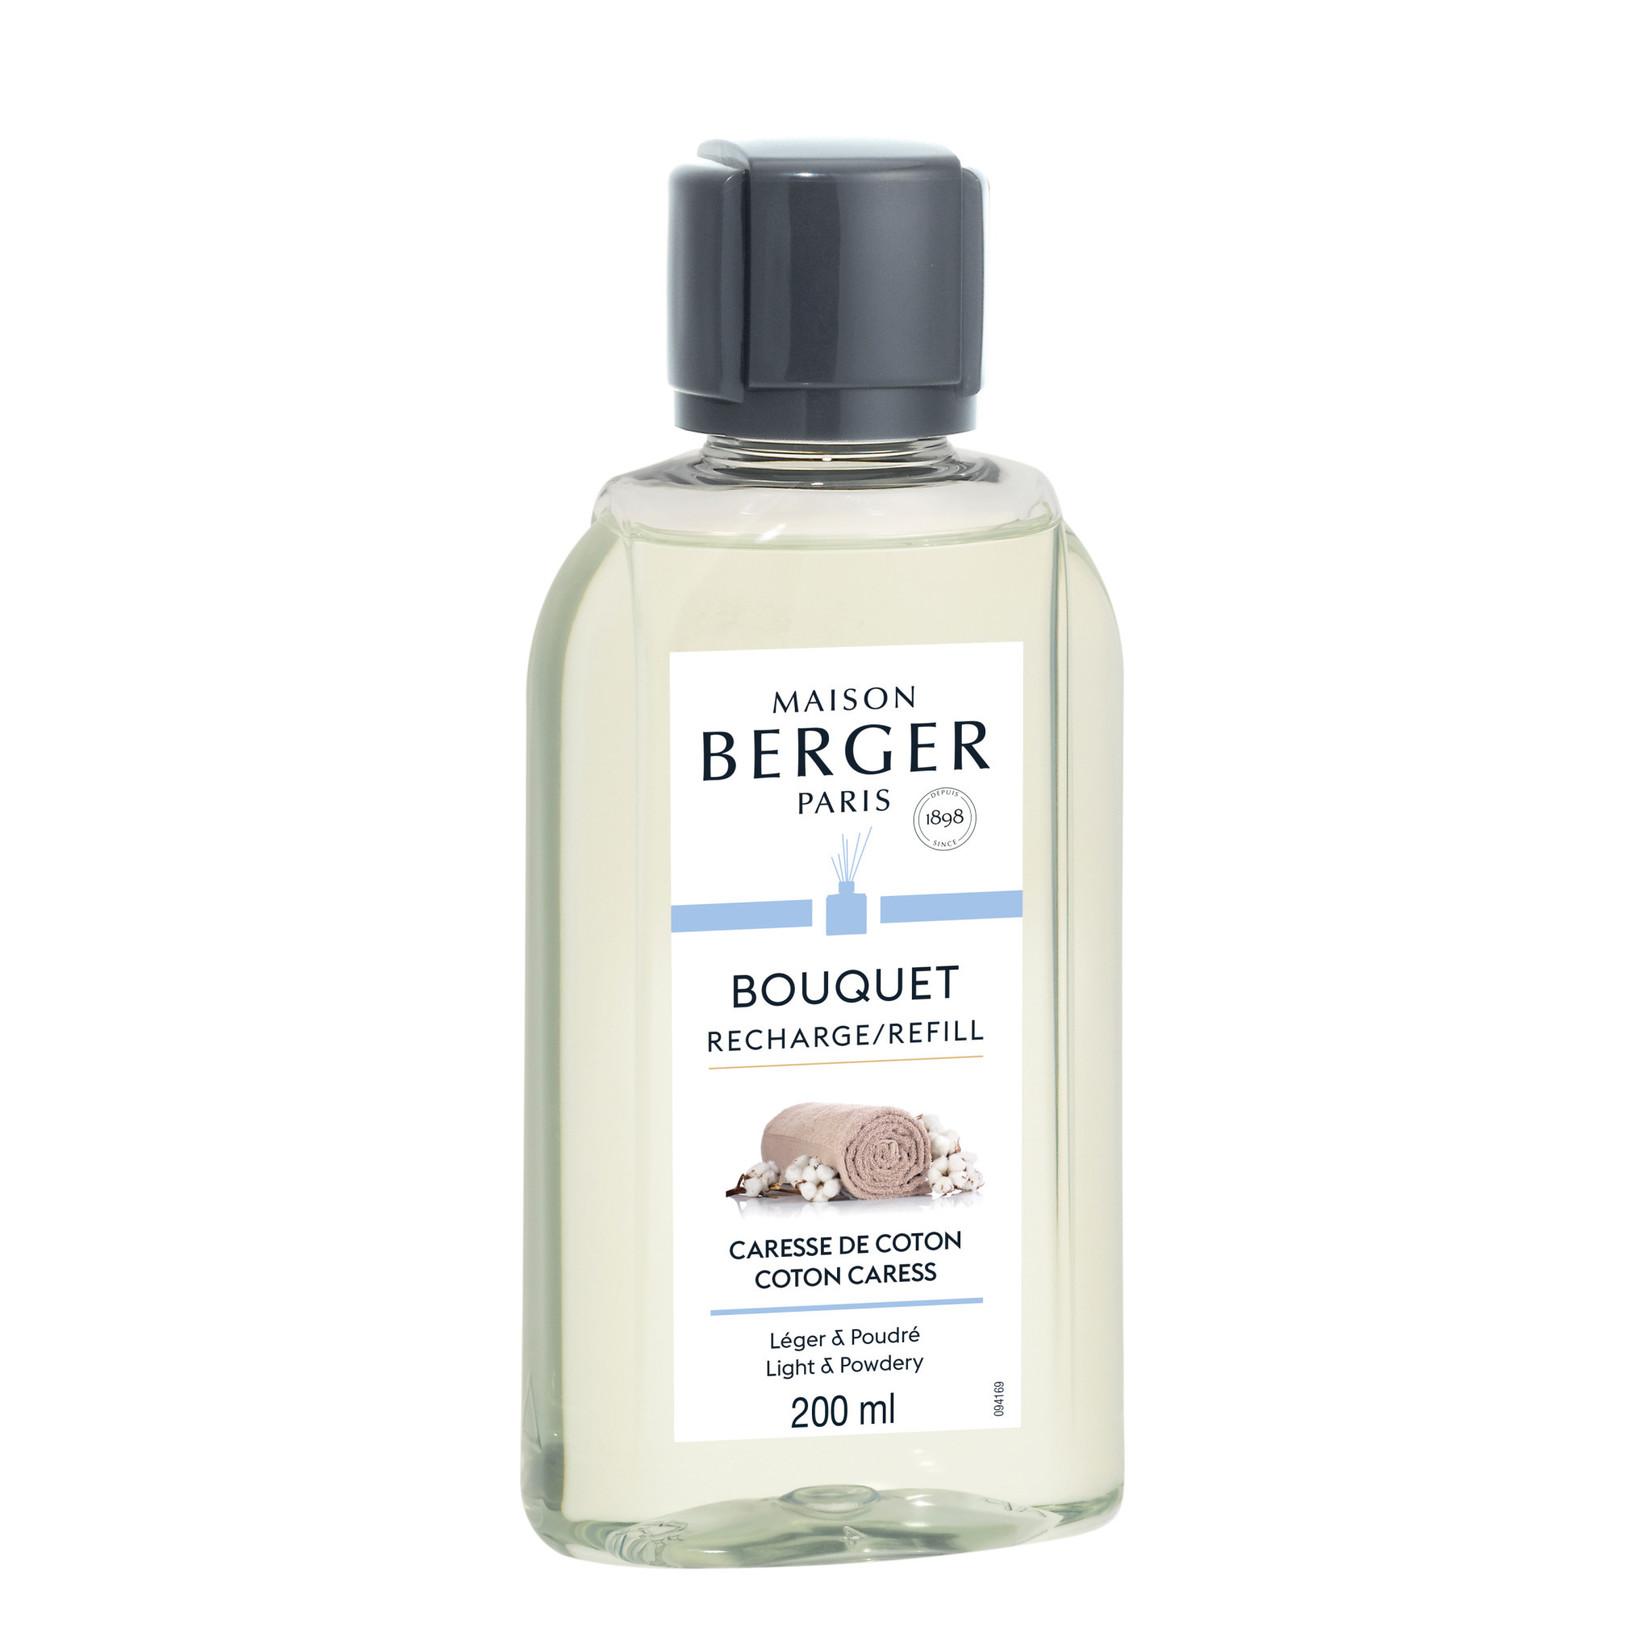 Lampe Berger Navulling parfumverspreider 200ml Caresse de coton